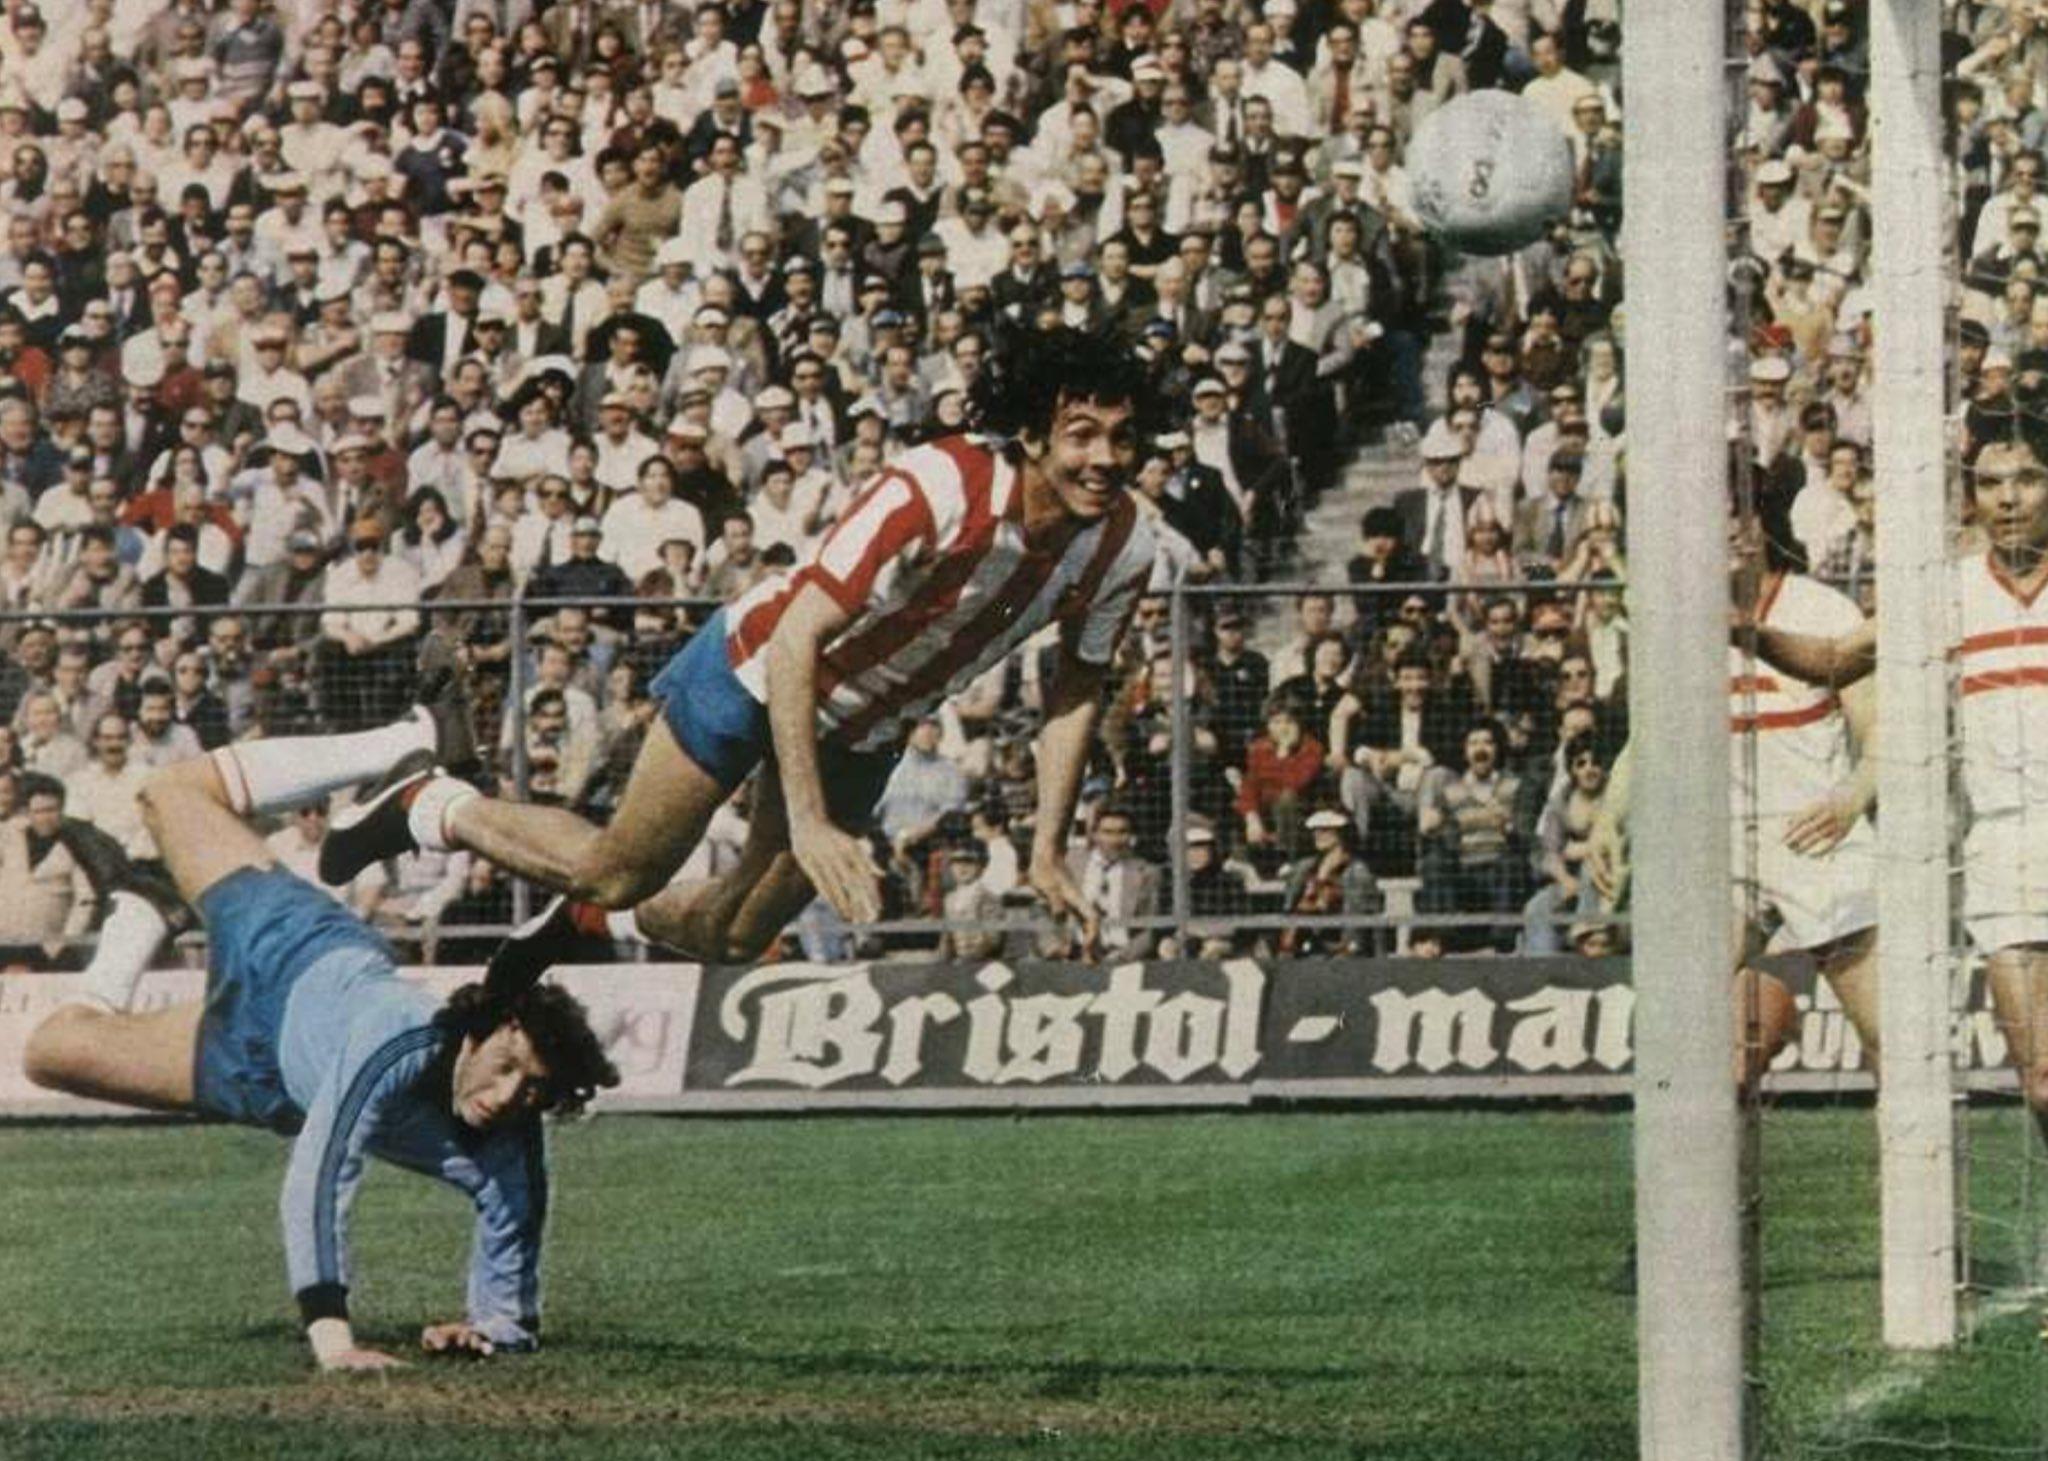 FOTOS HISTORICAS O CHULAS  DE FUTBOL - Página 10 D-4oAU1XoAAcc13?format=jpg&name=4096x4096